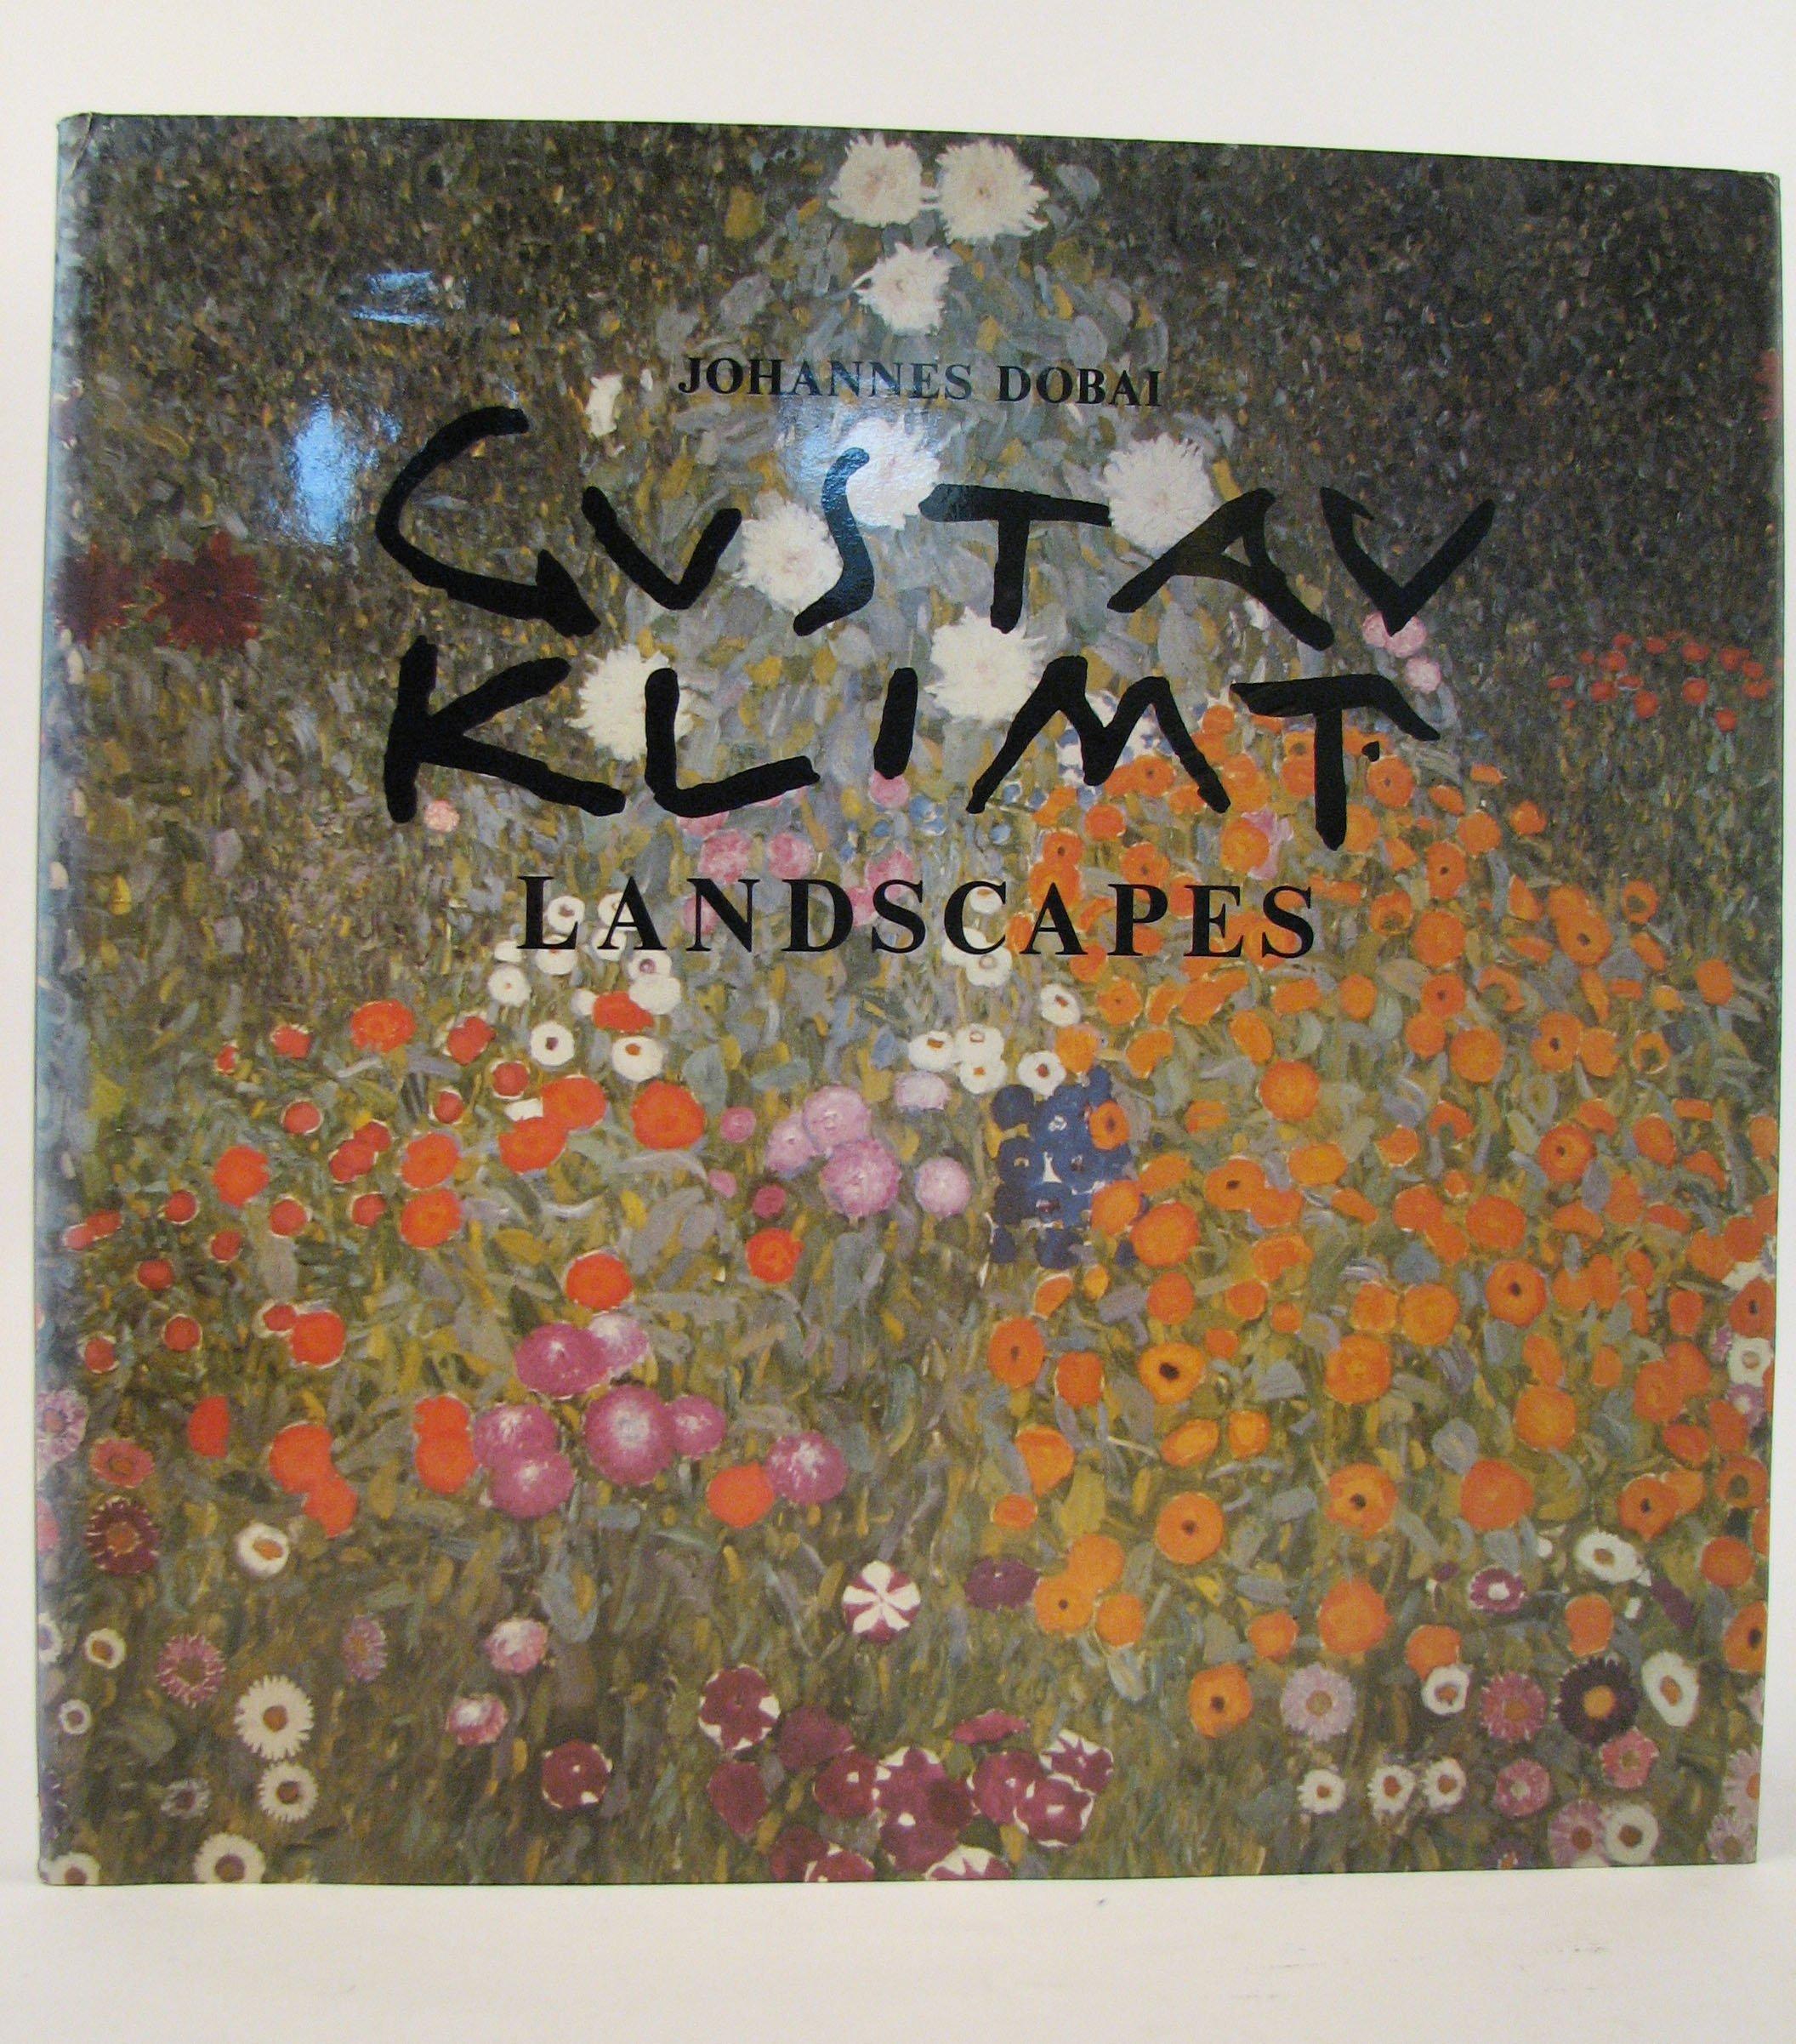 Gustav Klimt: Landscapes: Amazon.co.uk: Johannes Dobai, Gustav Klimt:  9780297793854: Books